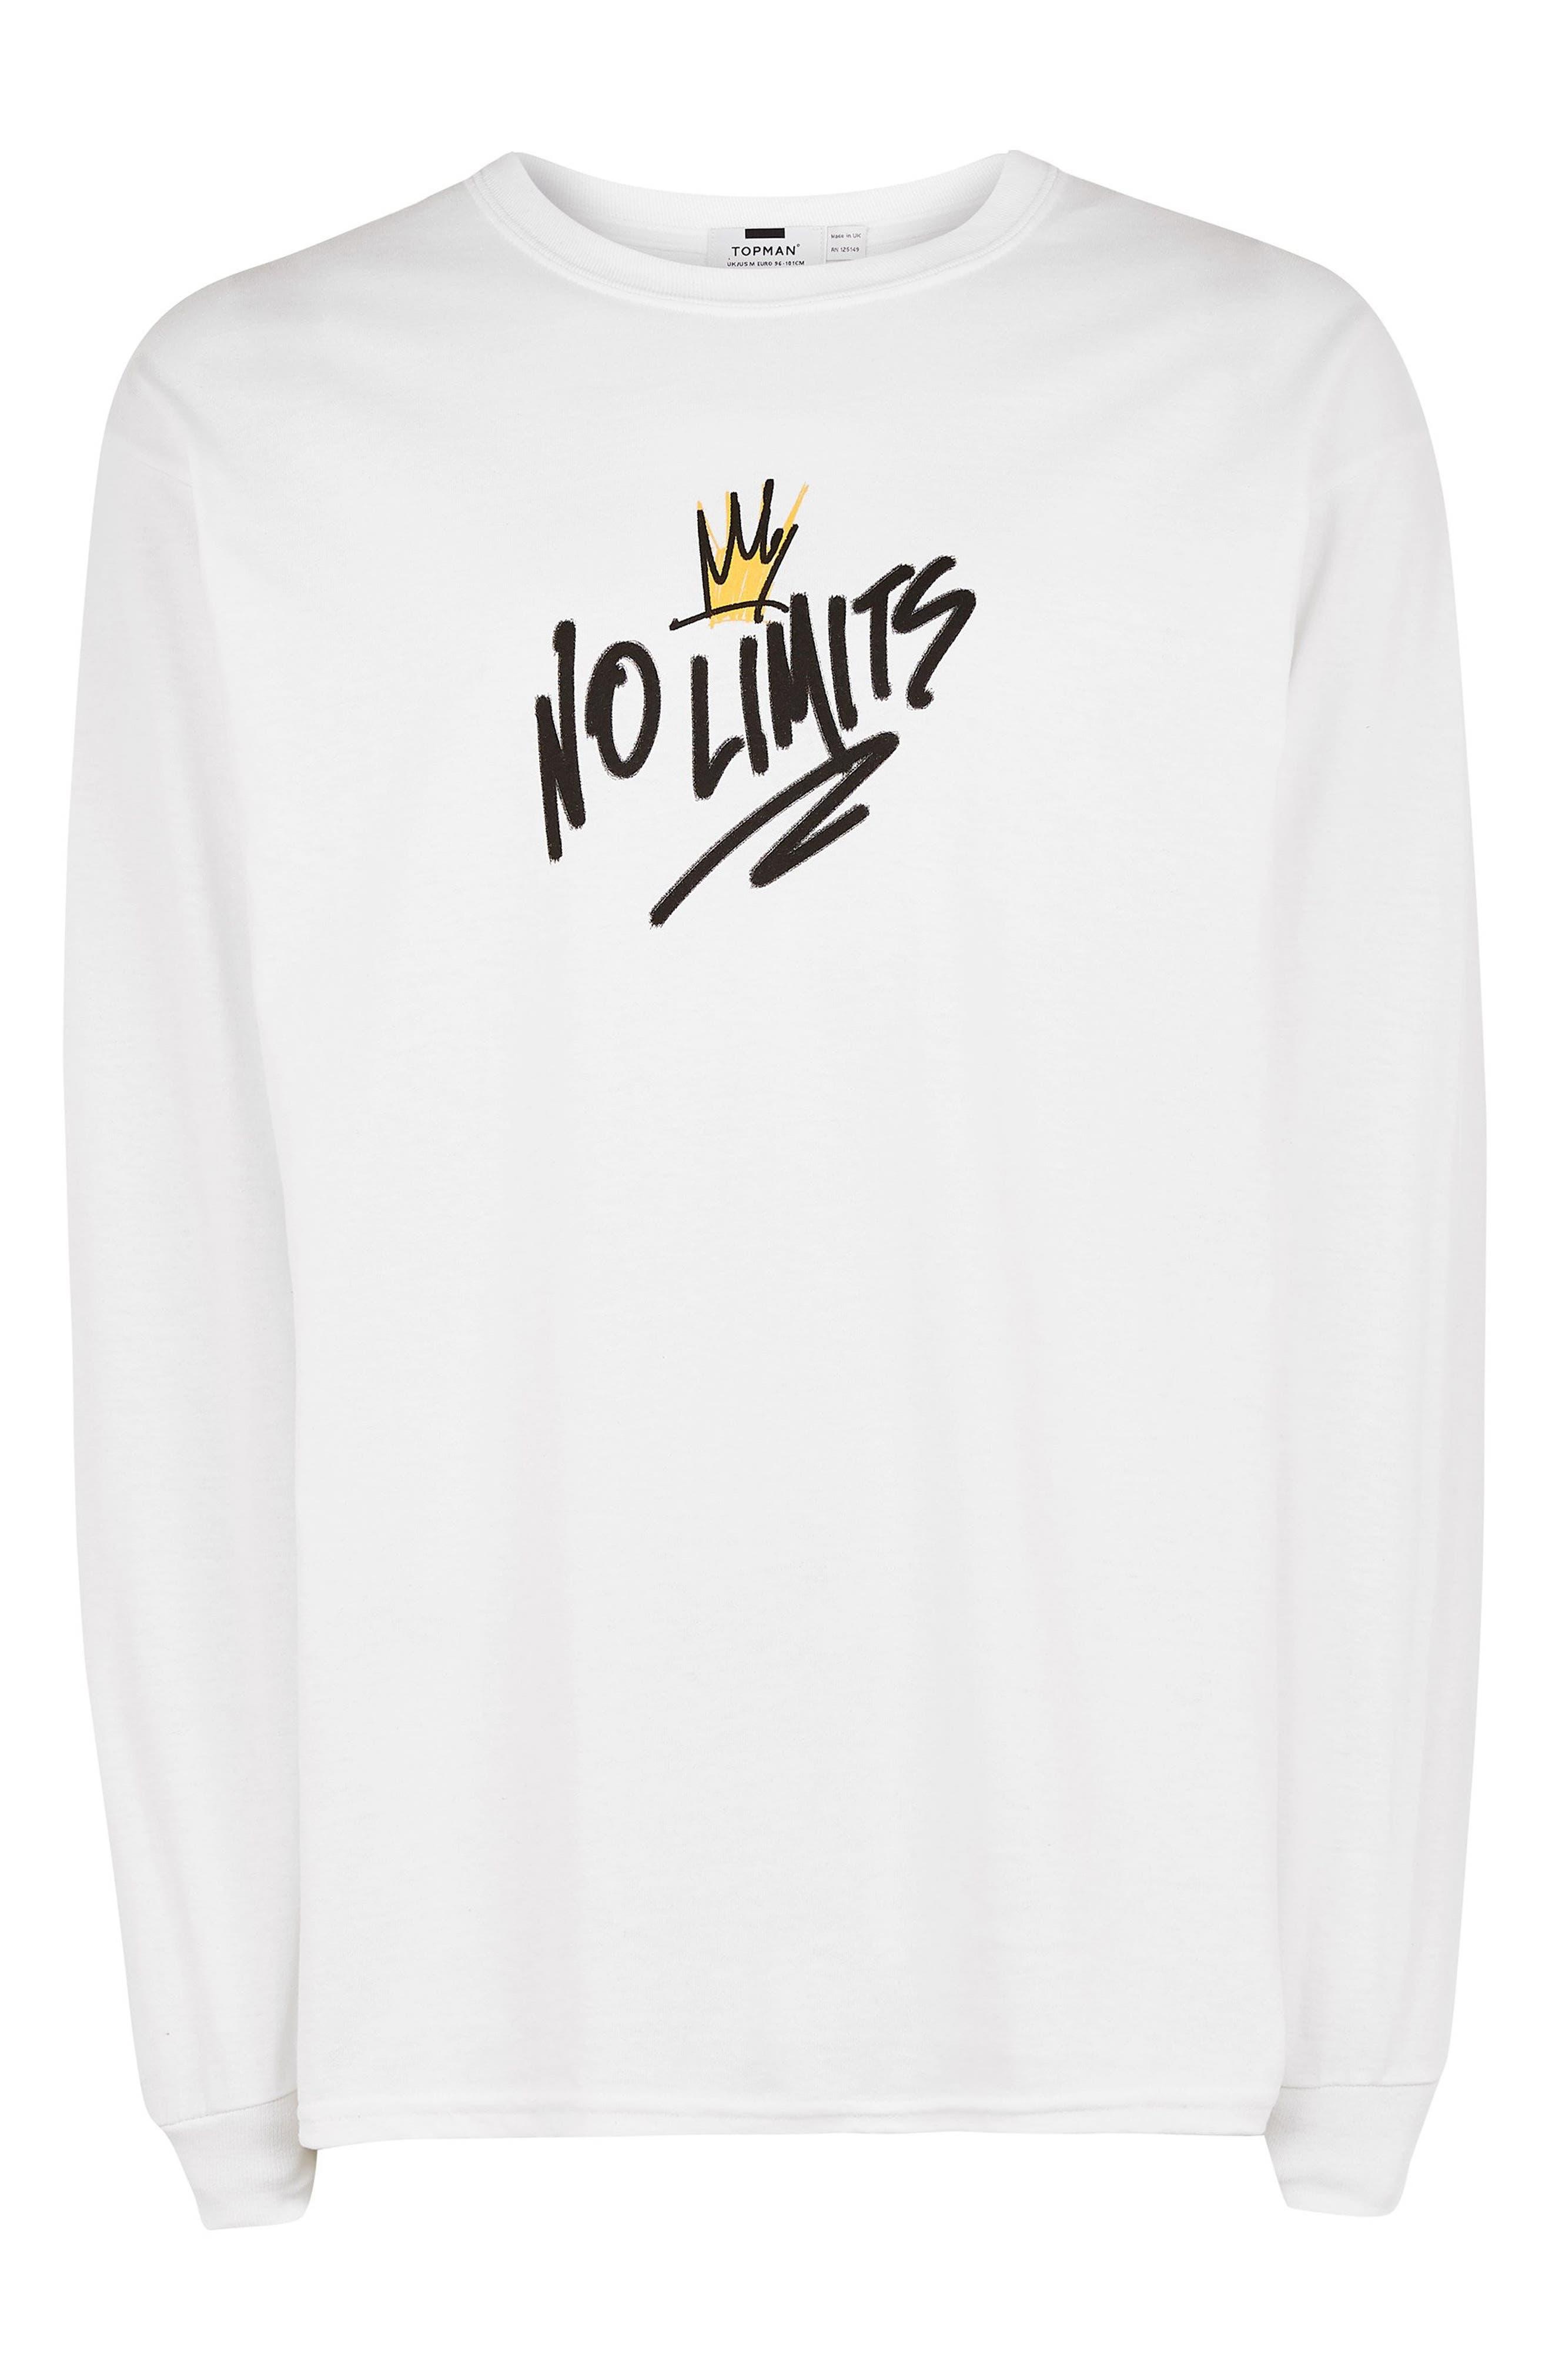 No Limits Graphic T-Shirt,                             Alternate thumbnail 3, color,                             WHITE MULTI